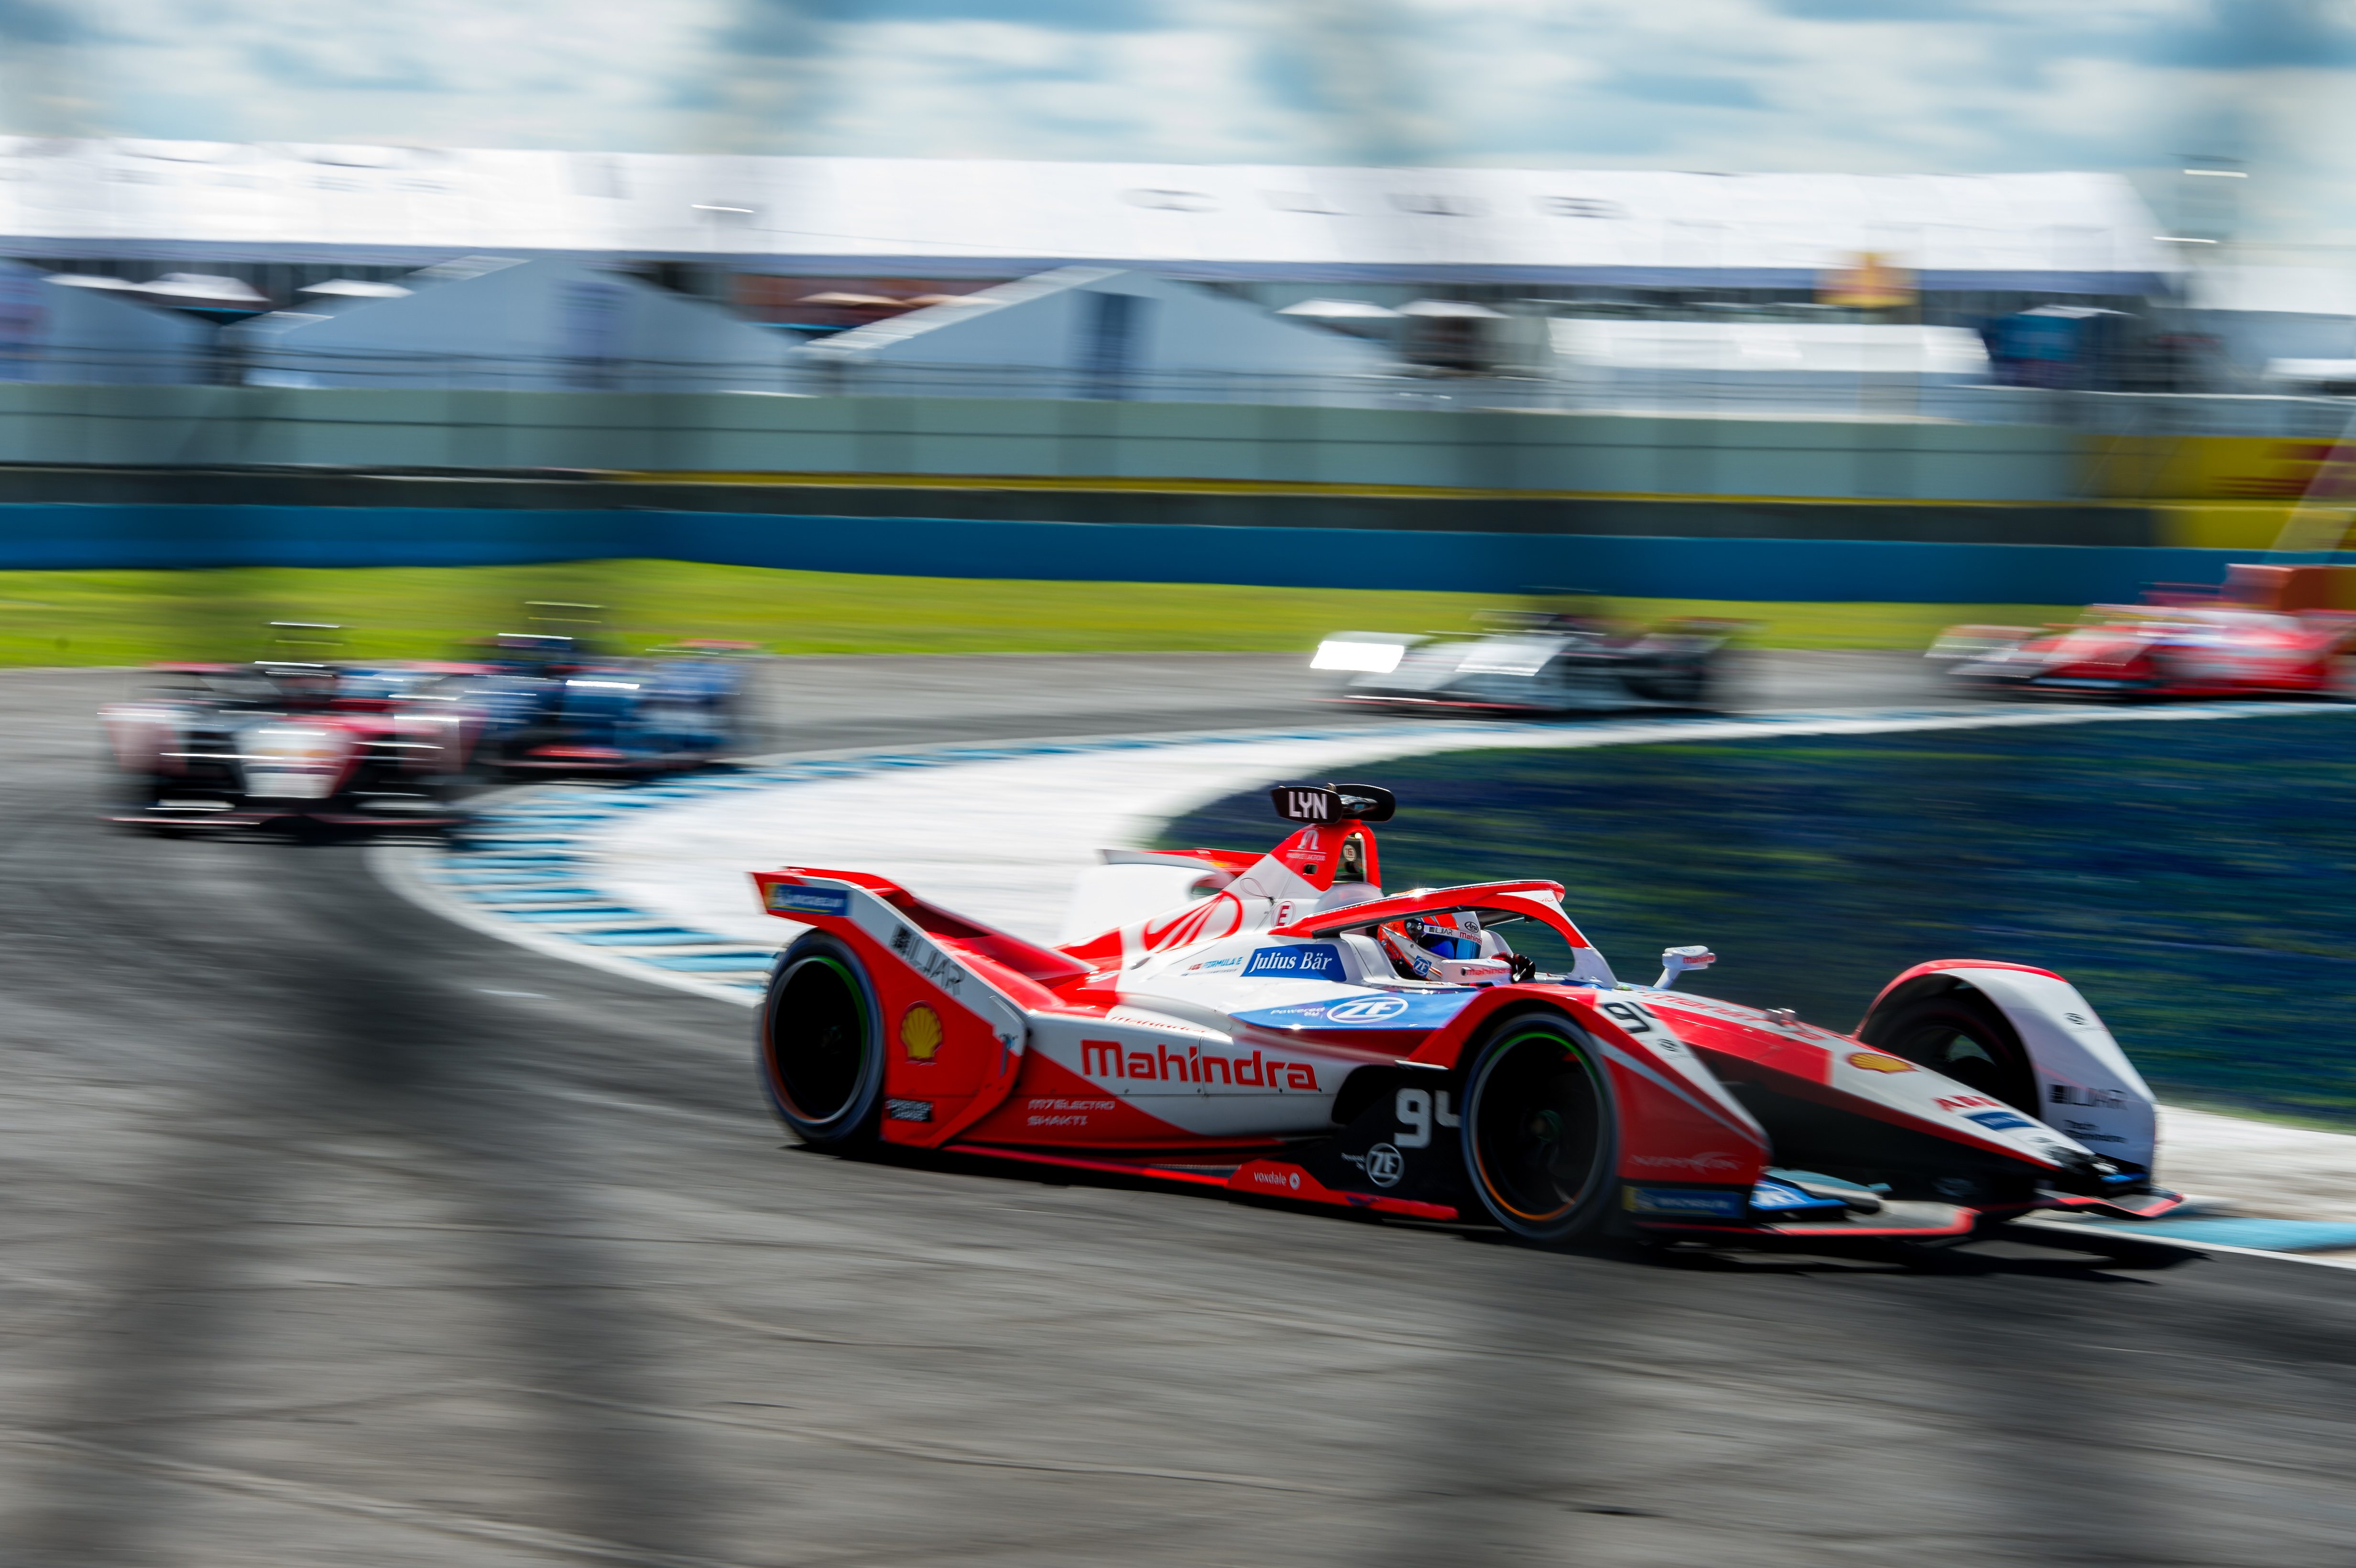 Alex Lynn Mahindra Puebla Formula E 2021